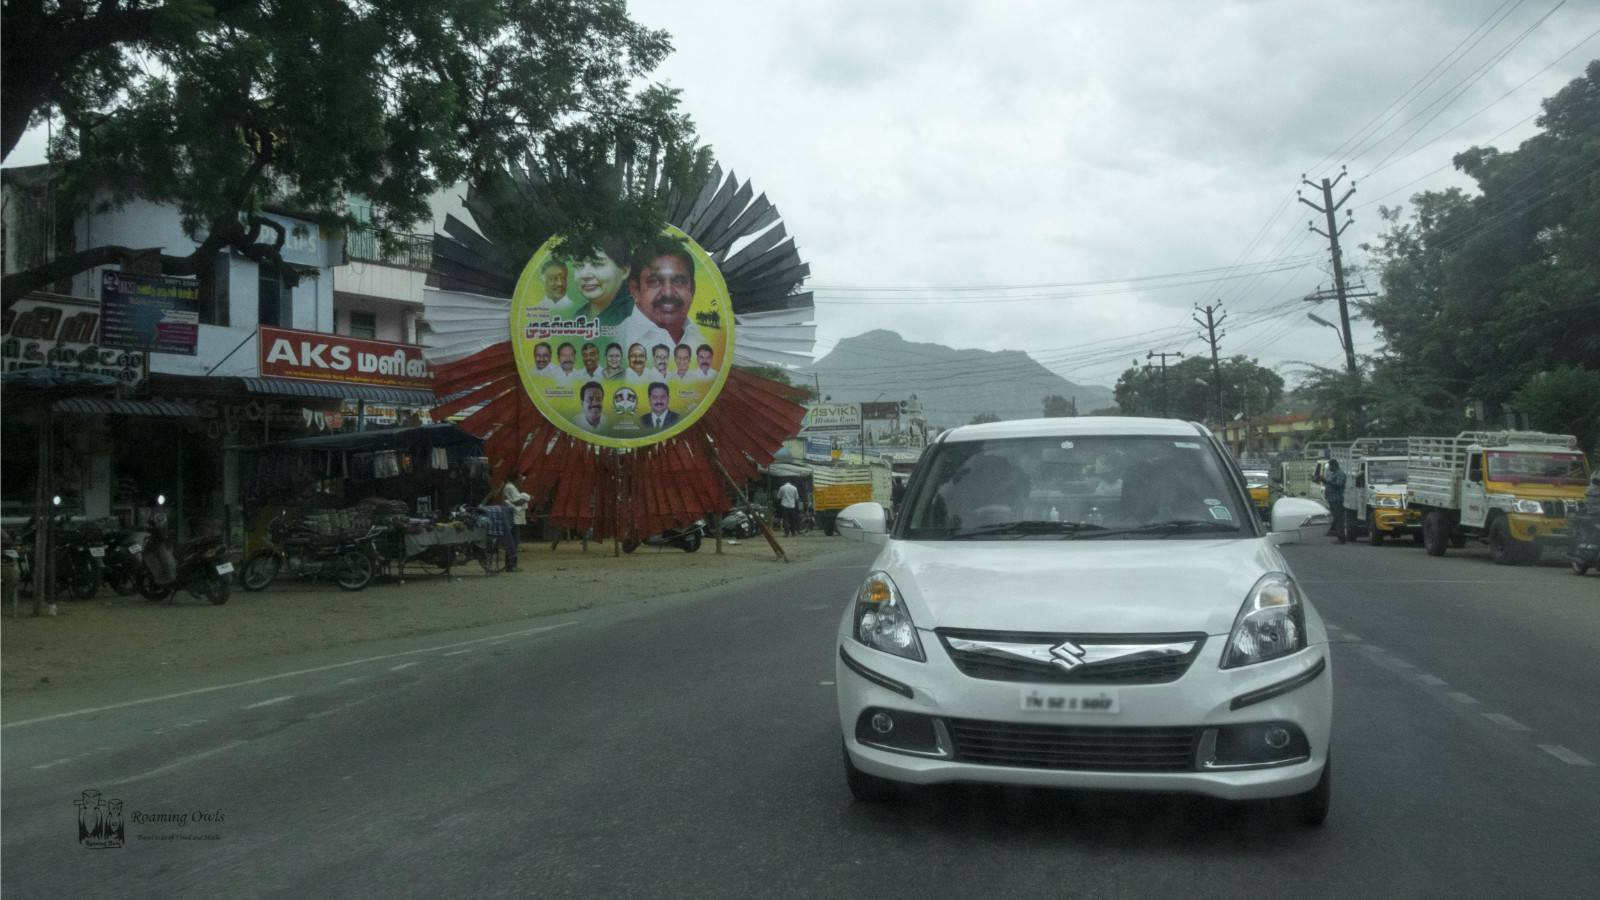 Edappadi palaniswamy, Chiefminister Tamilnadu, Tamilnadu Banners